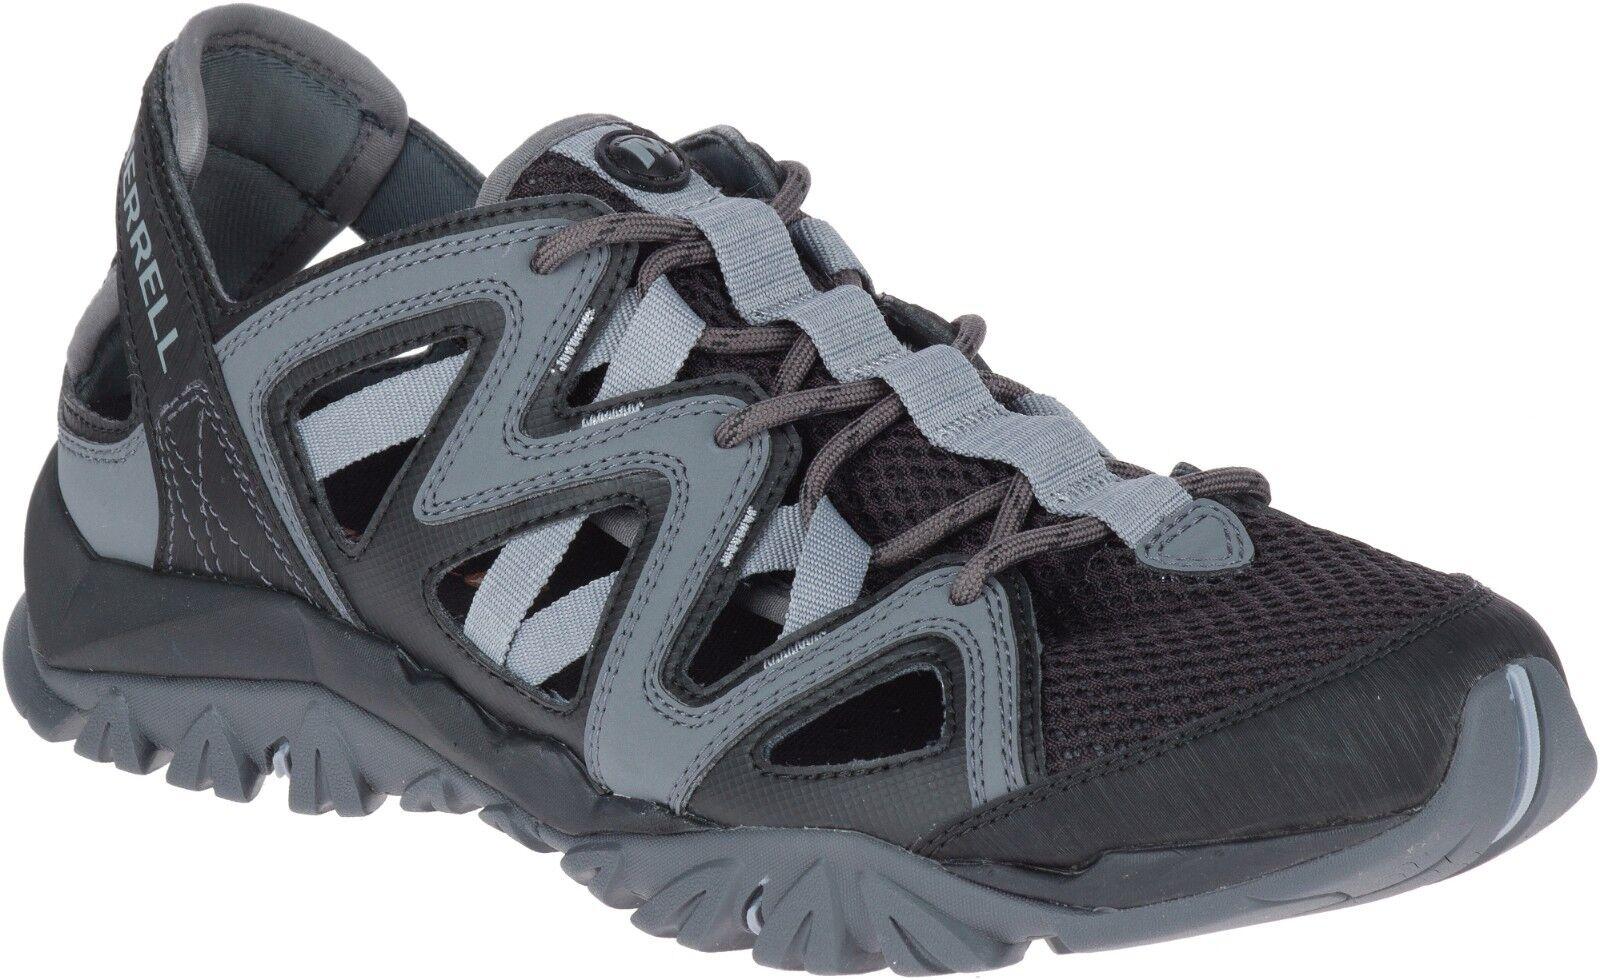 Merrell Tetrex Crest Wrap Men's Size 10 Hydro Hike Closed Toe Sandals J12845 New